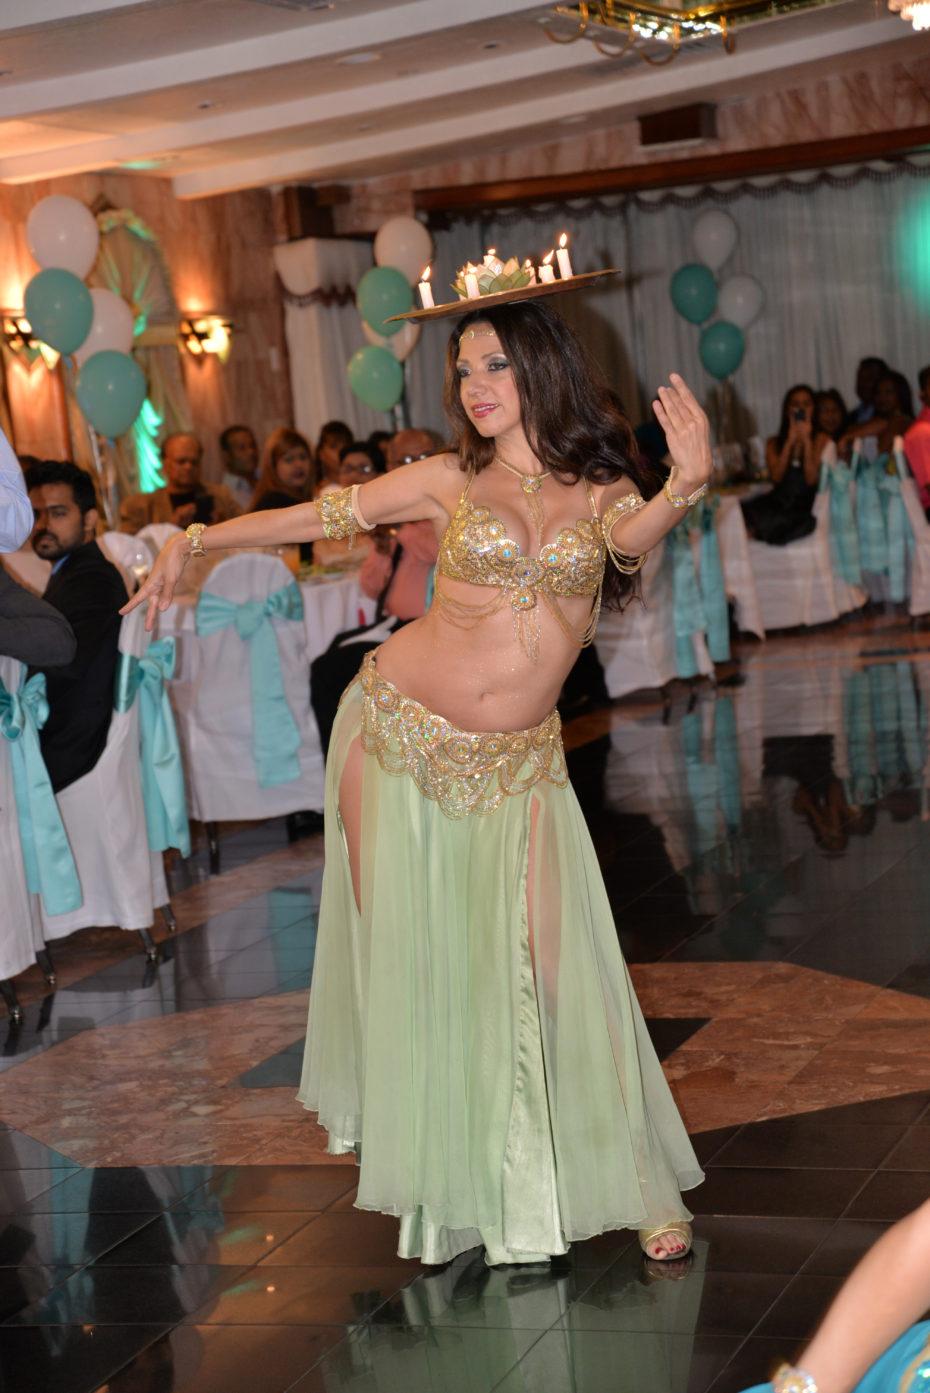 Belly dancer Sira NYC entertains wedding guests in Manhattan